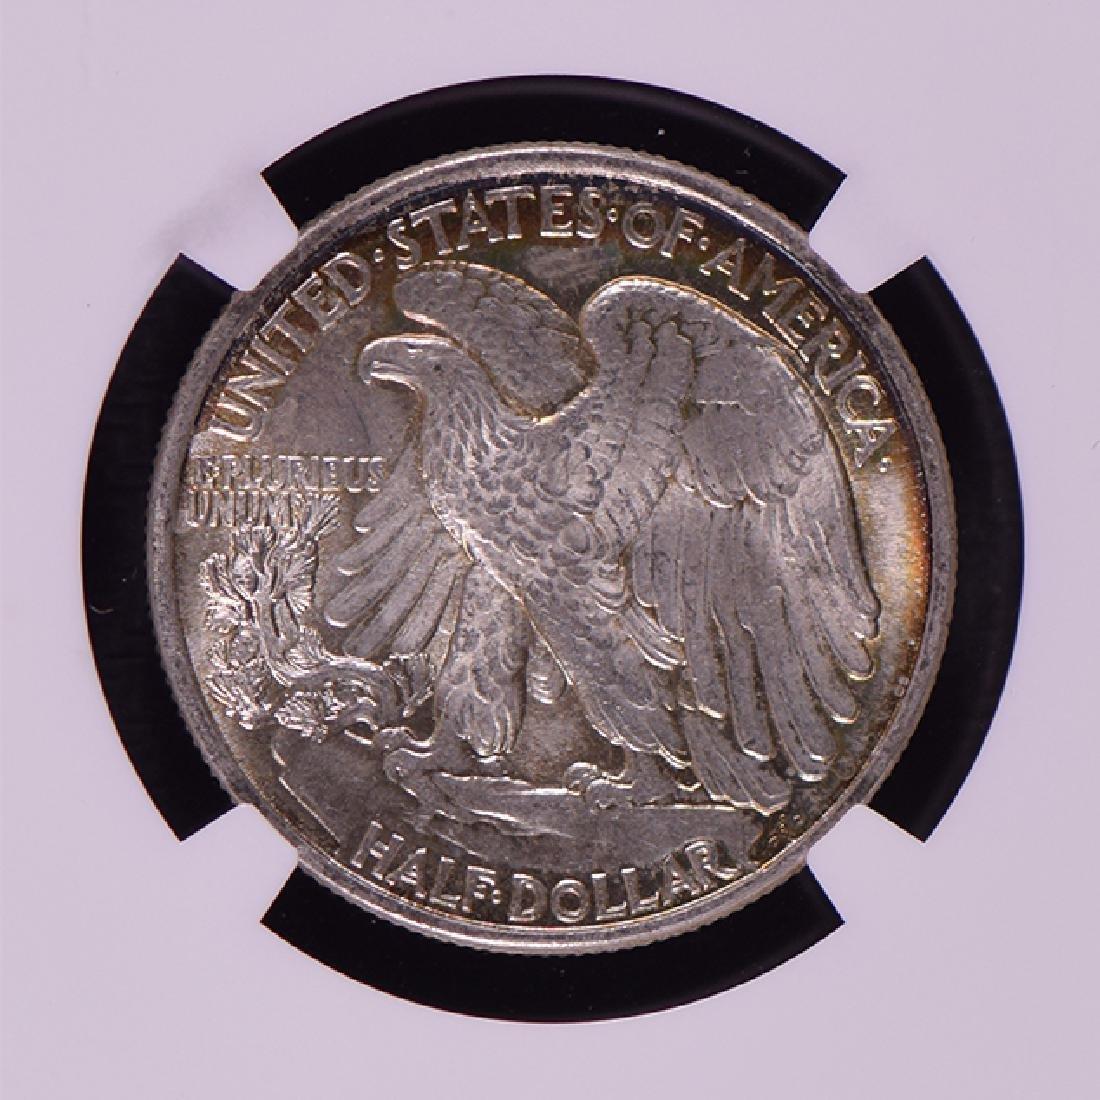 1943 Walking Liberty Half Dollar Coin NGC MS65 - 4